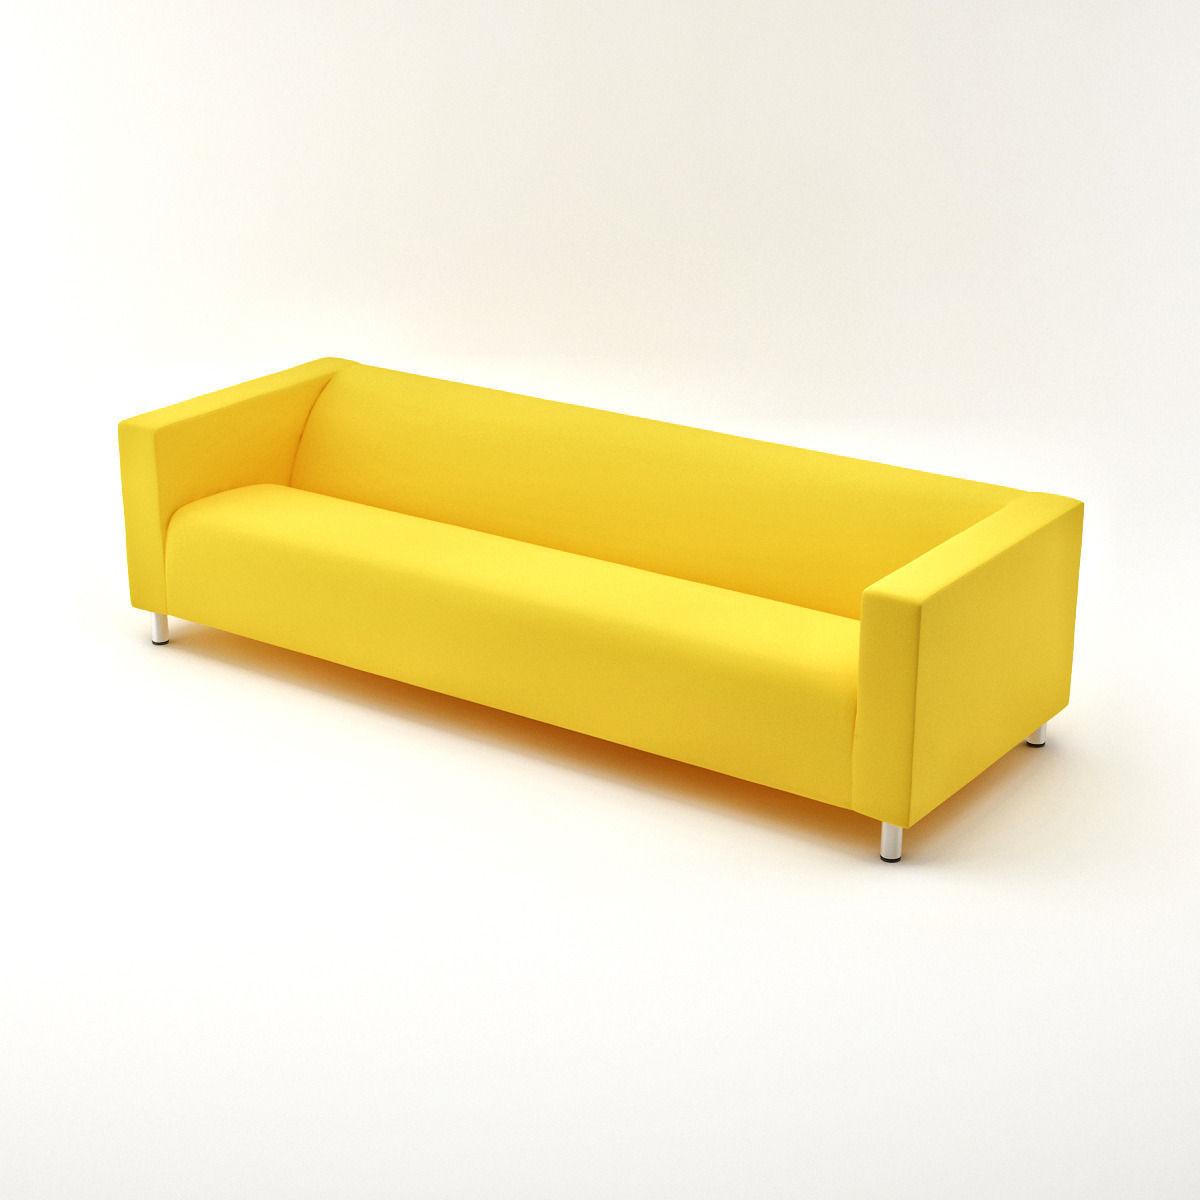 IKEA KLIPPAN Four-seat Sofa 3D Model .max - CGTrader.com